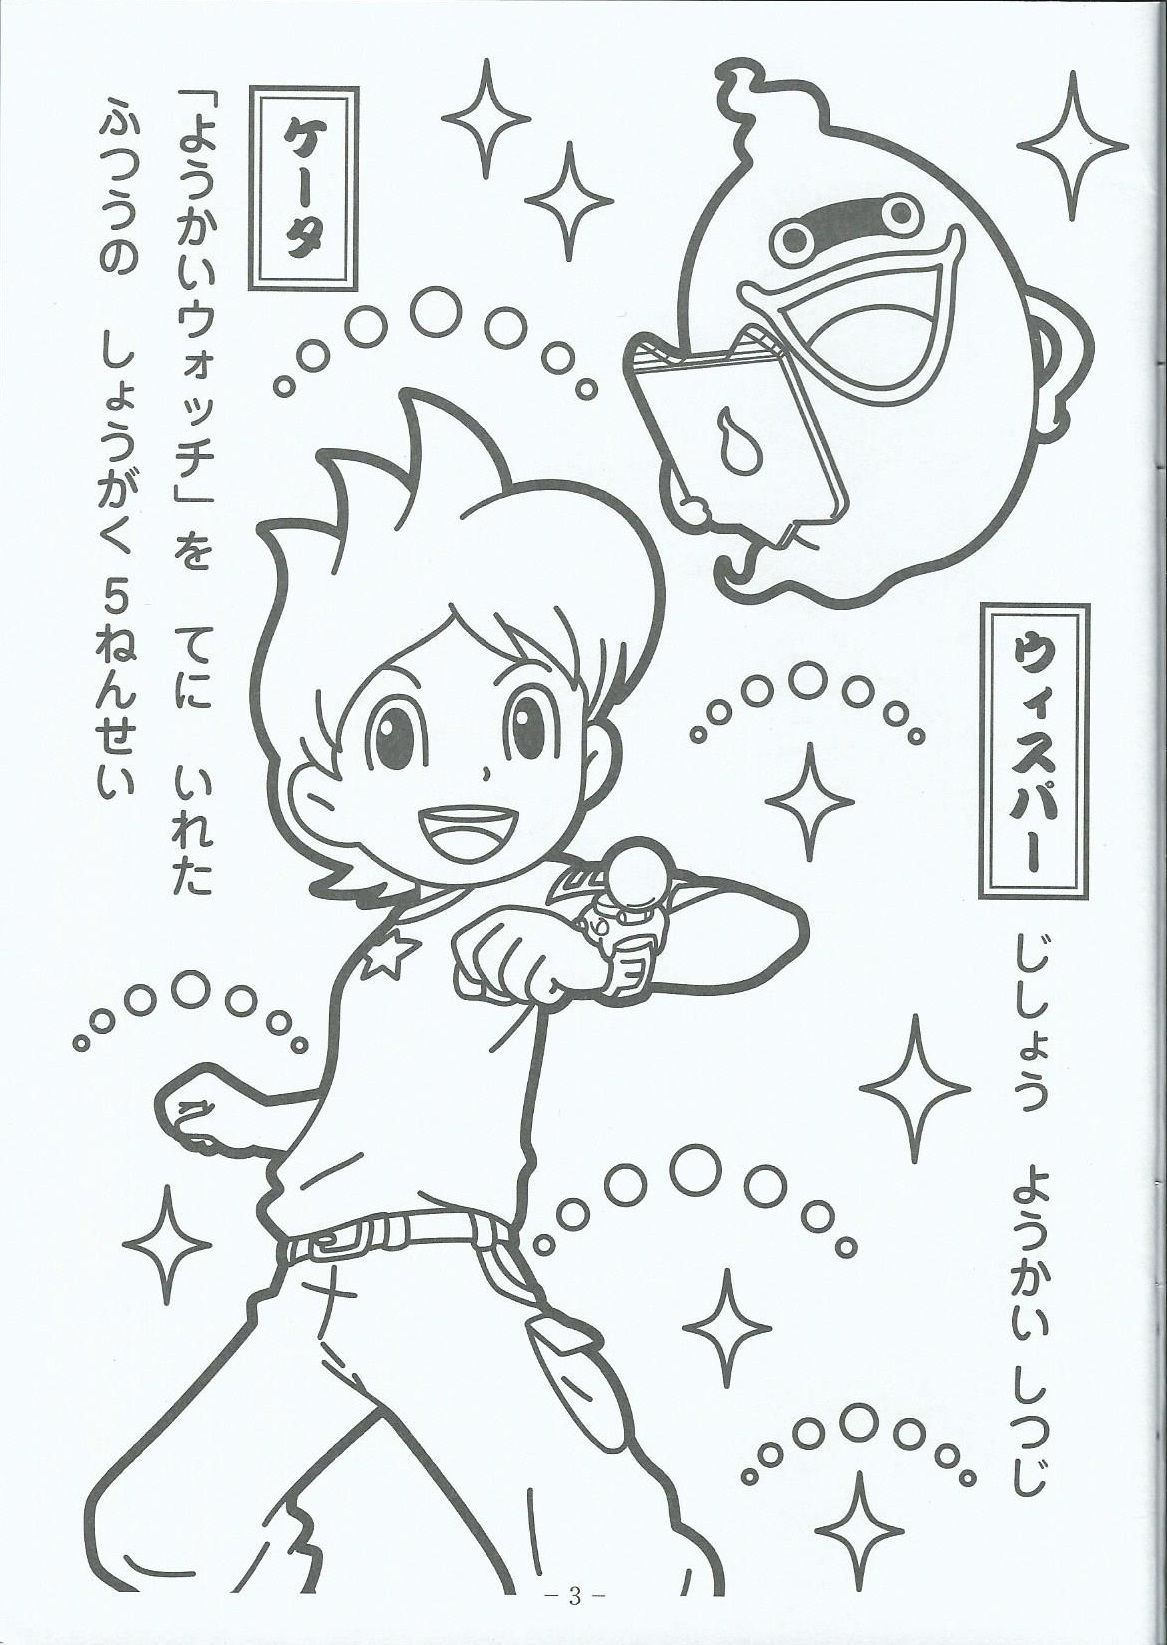 keita and his pal whisper  絵 お気に入り